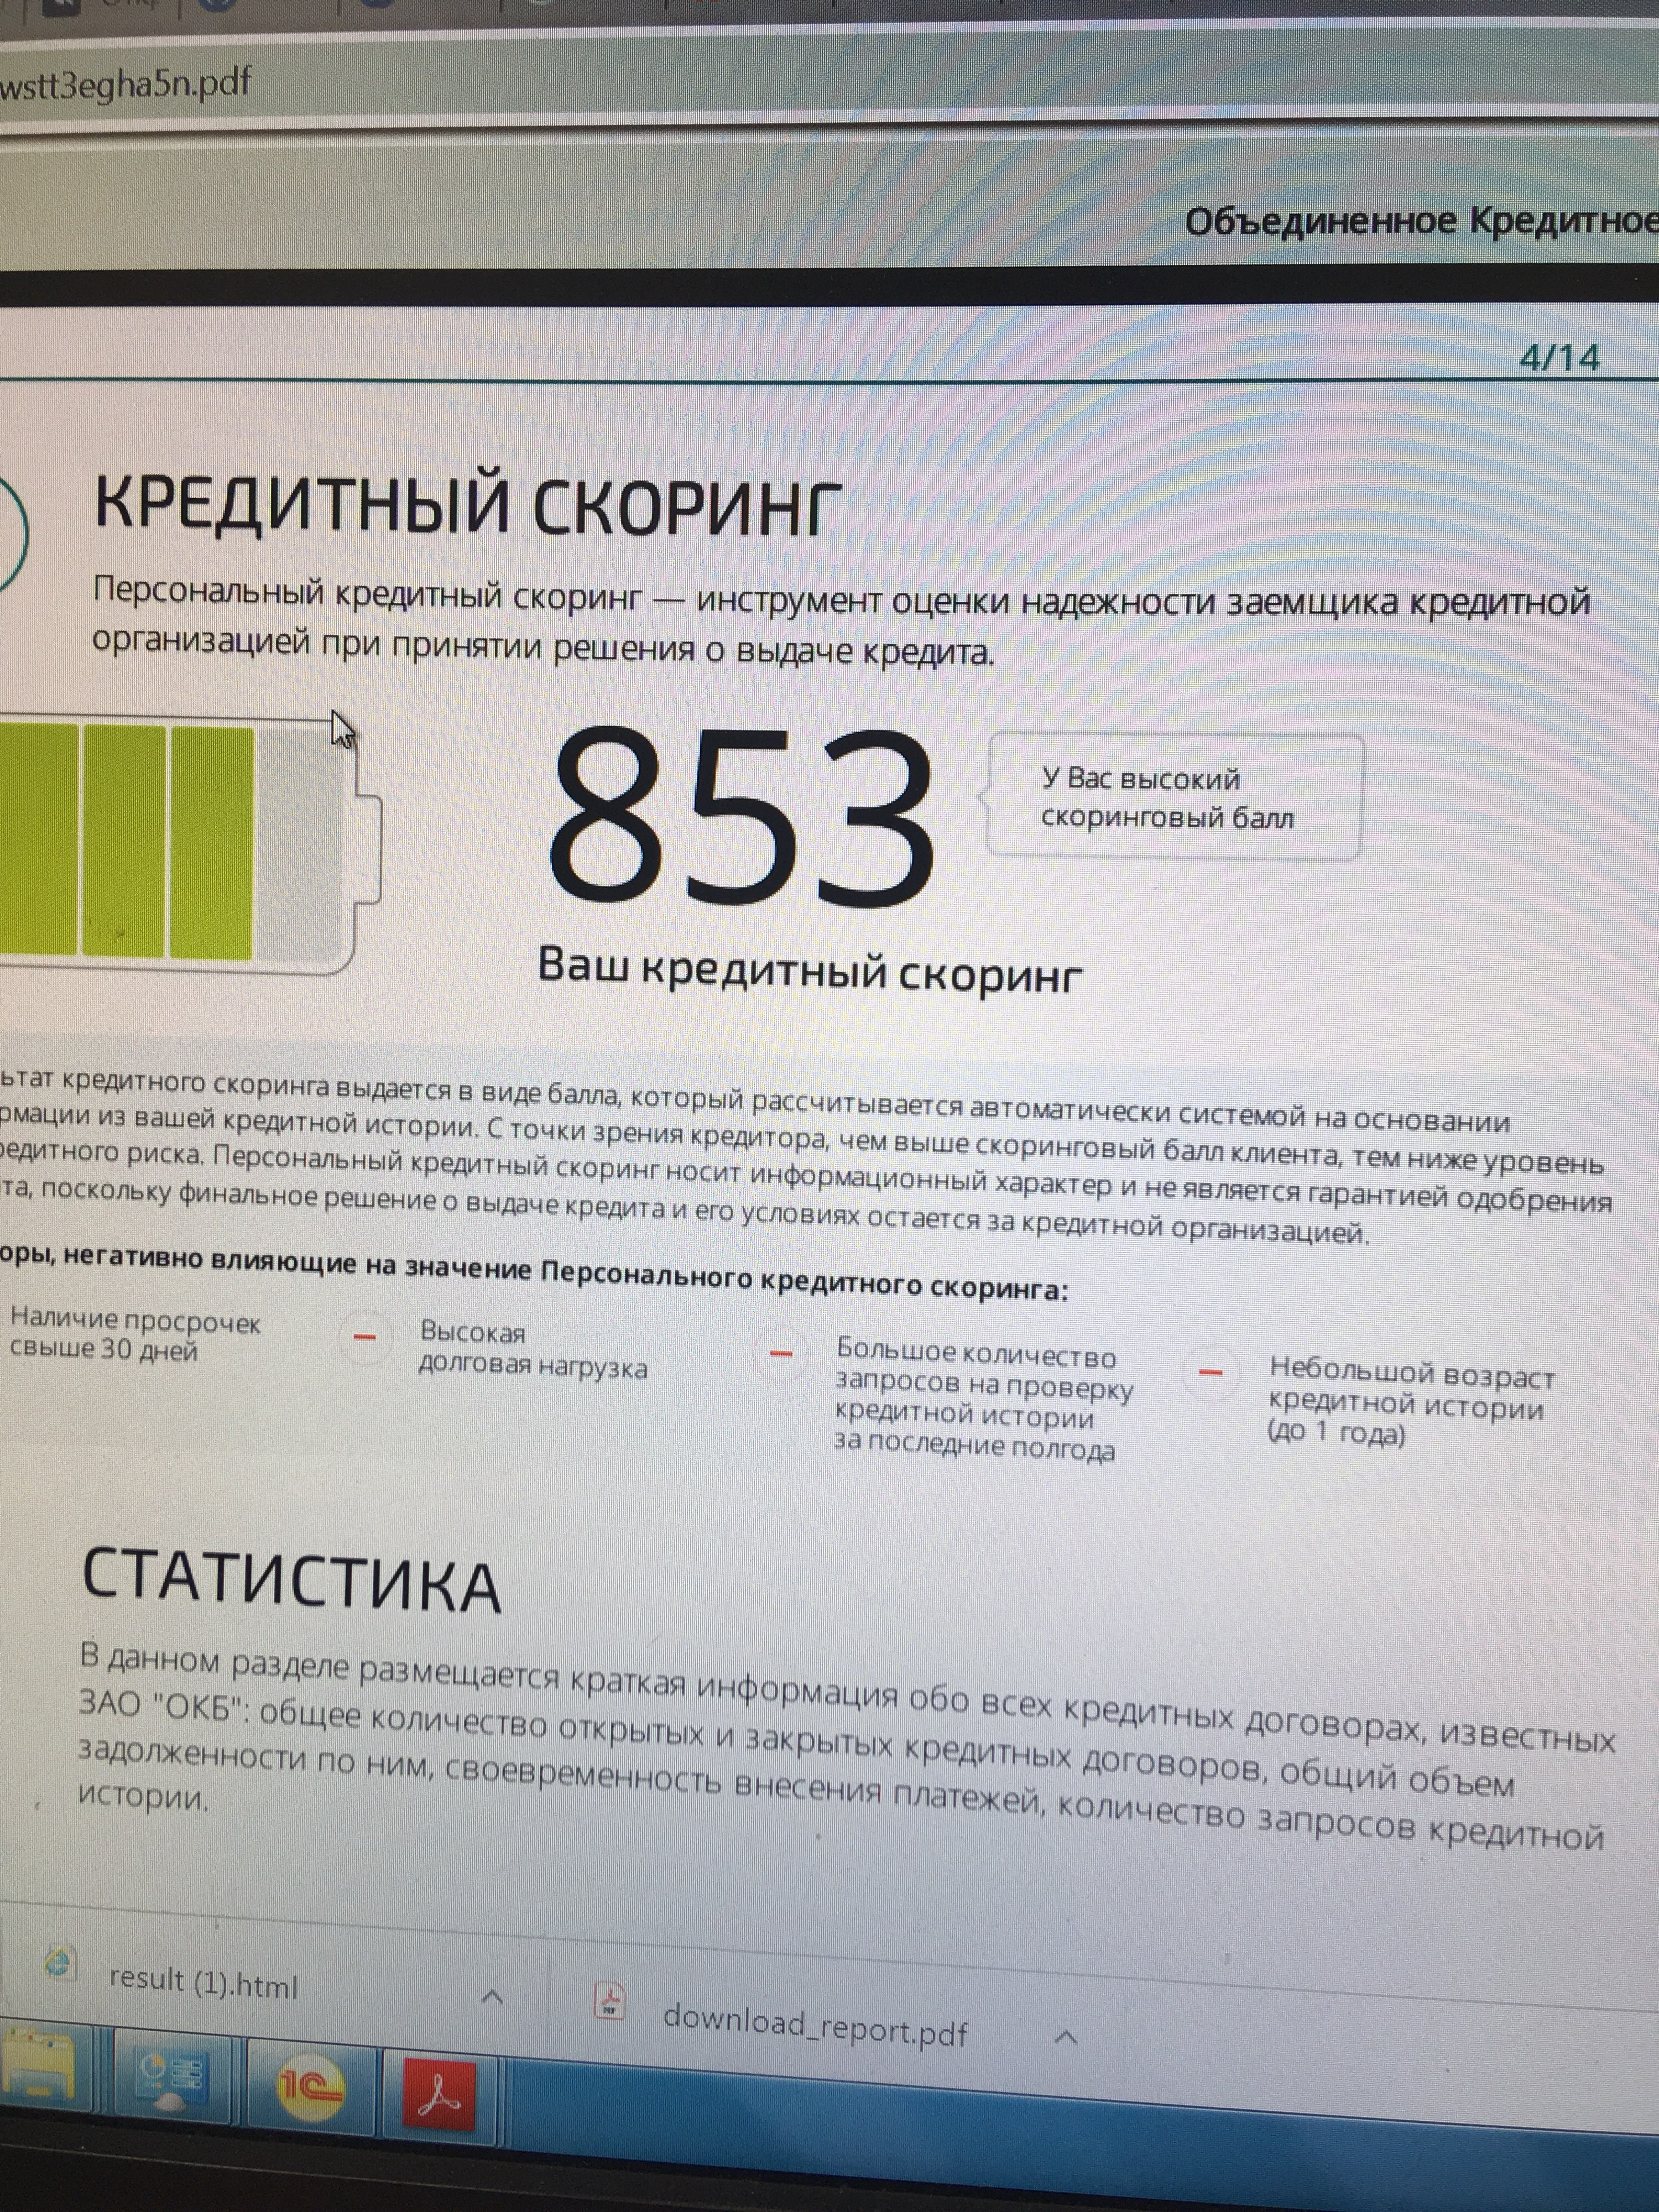 займы онлайн на карту с просрочками zaimyna-kartu.ru